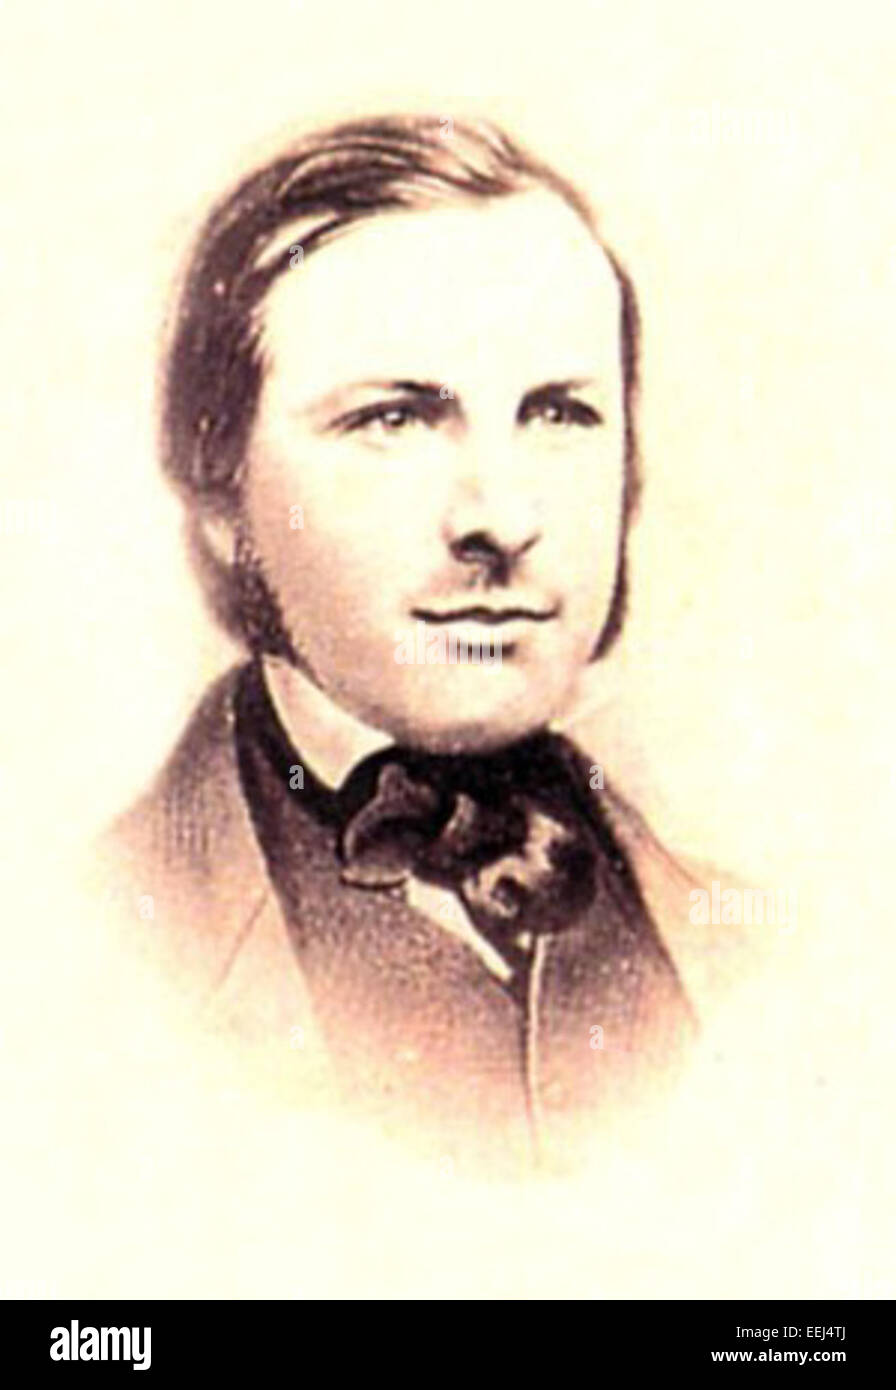 Augustus Welby Northmore Pugin - Stock Image